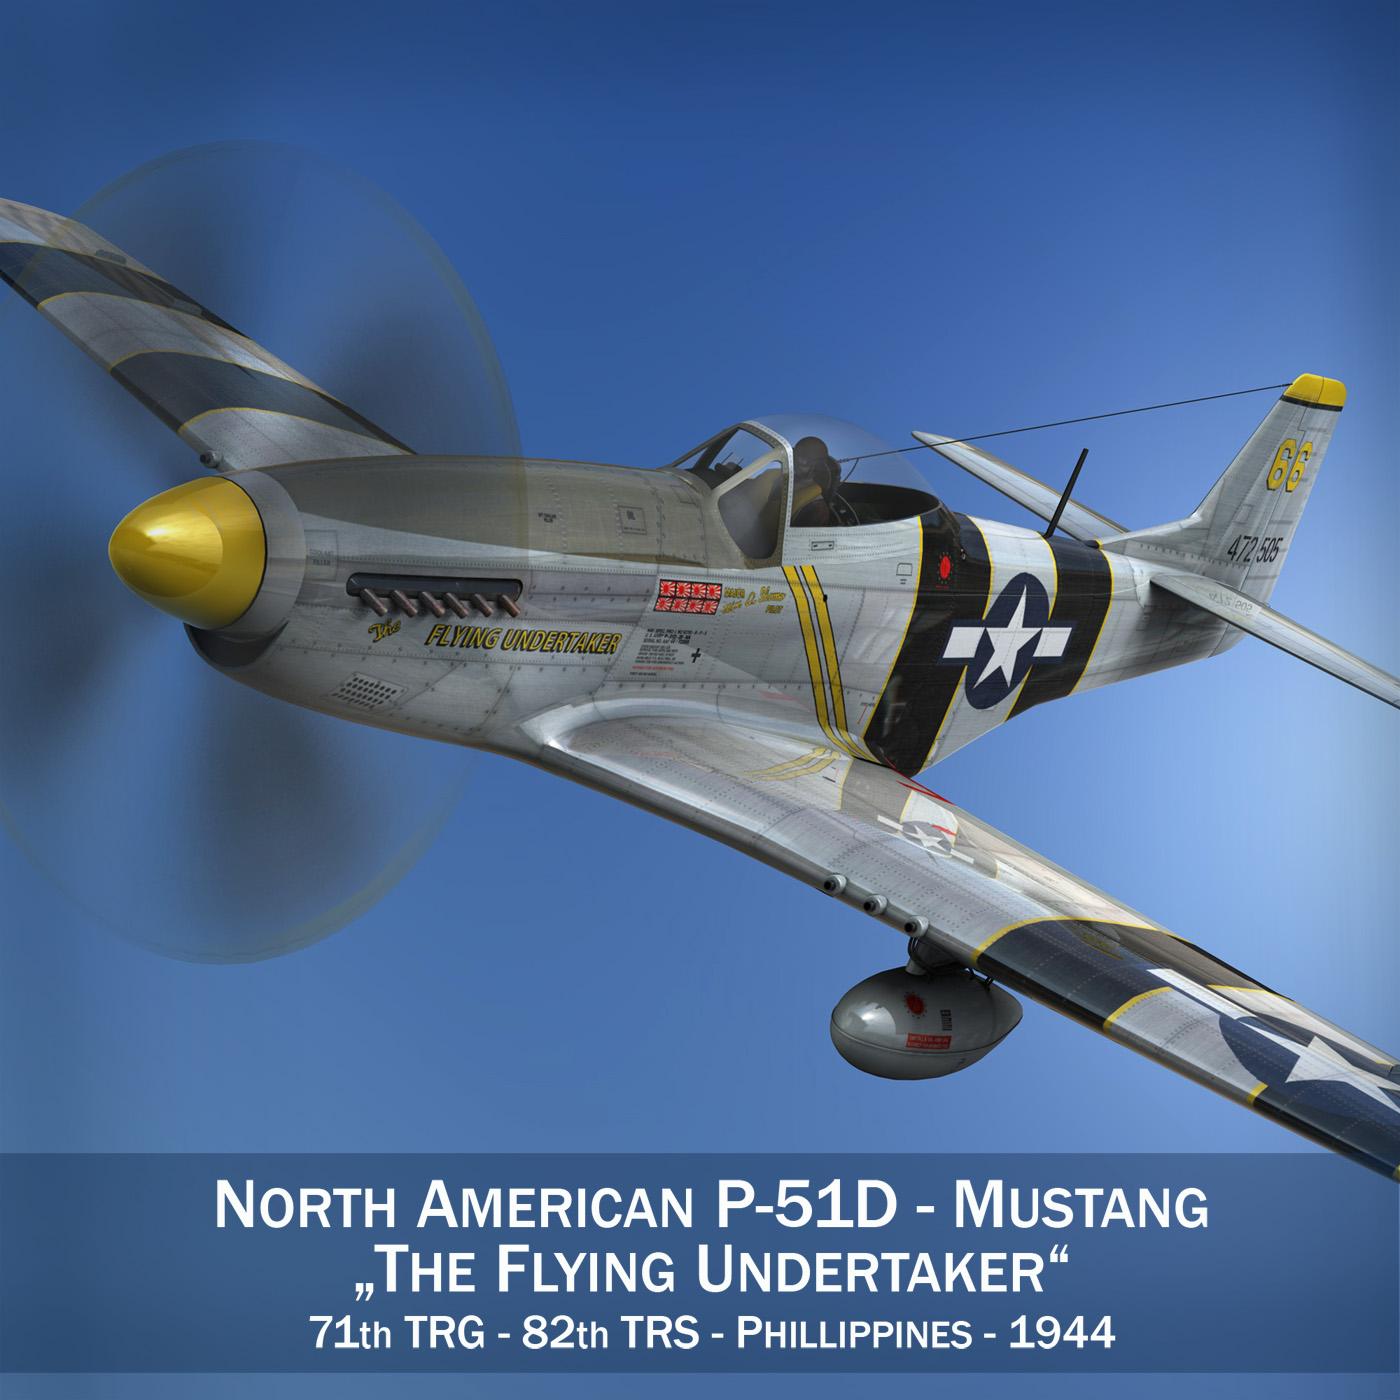 North American P-51D Mustang - Flying Undertaker 3d model fbx c4d lwo lws lw obj 280155